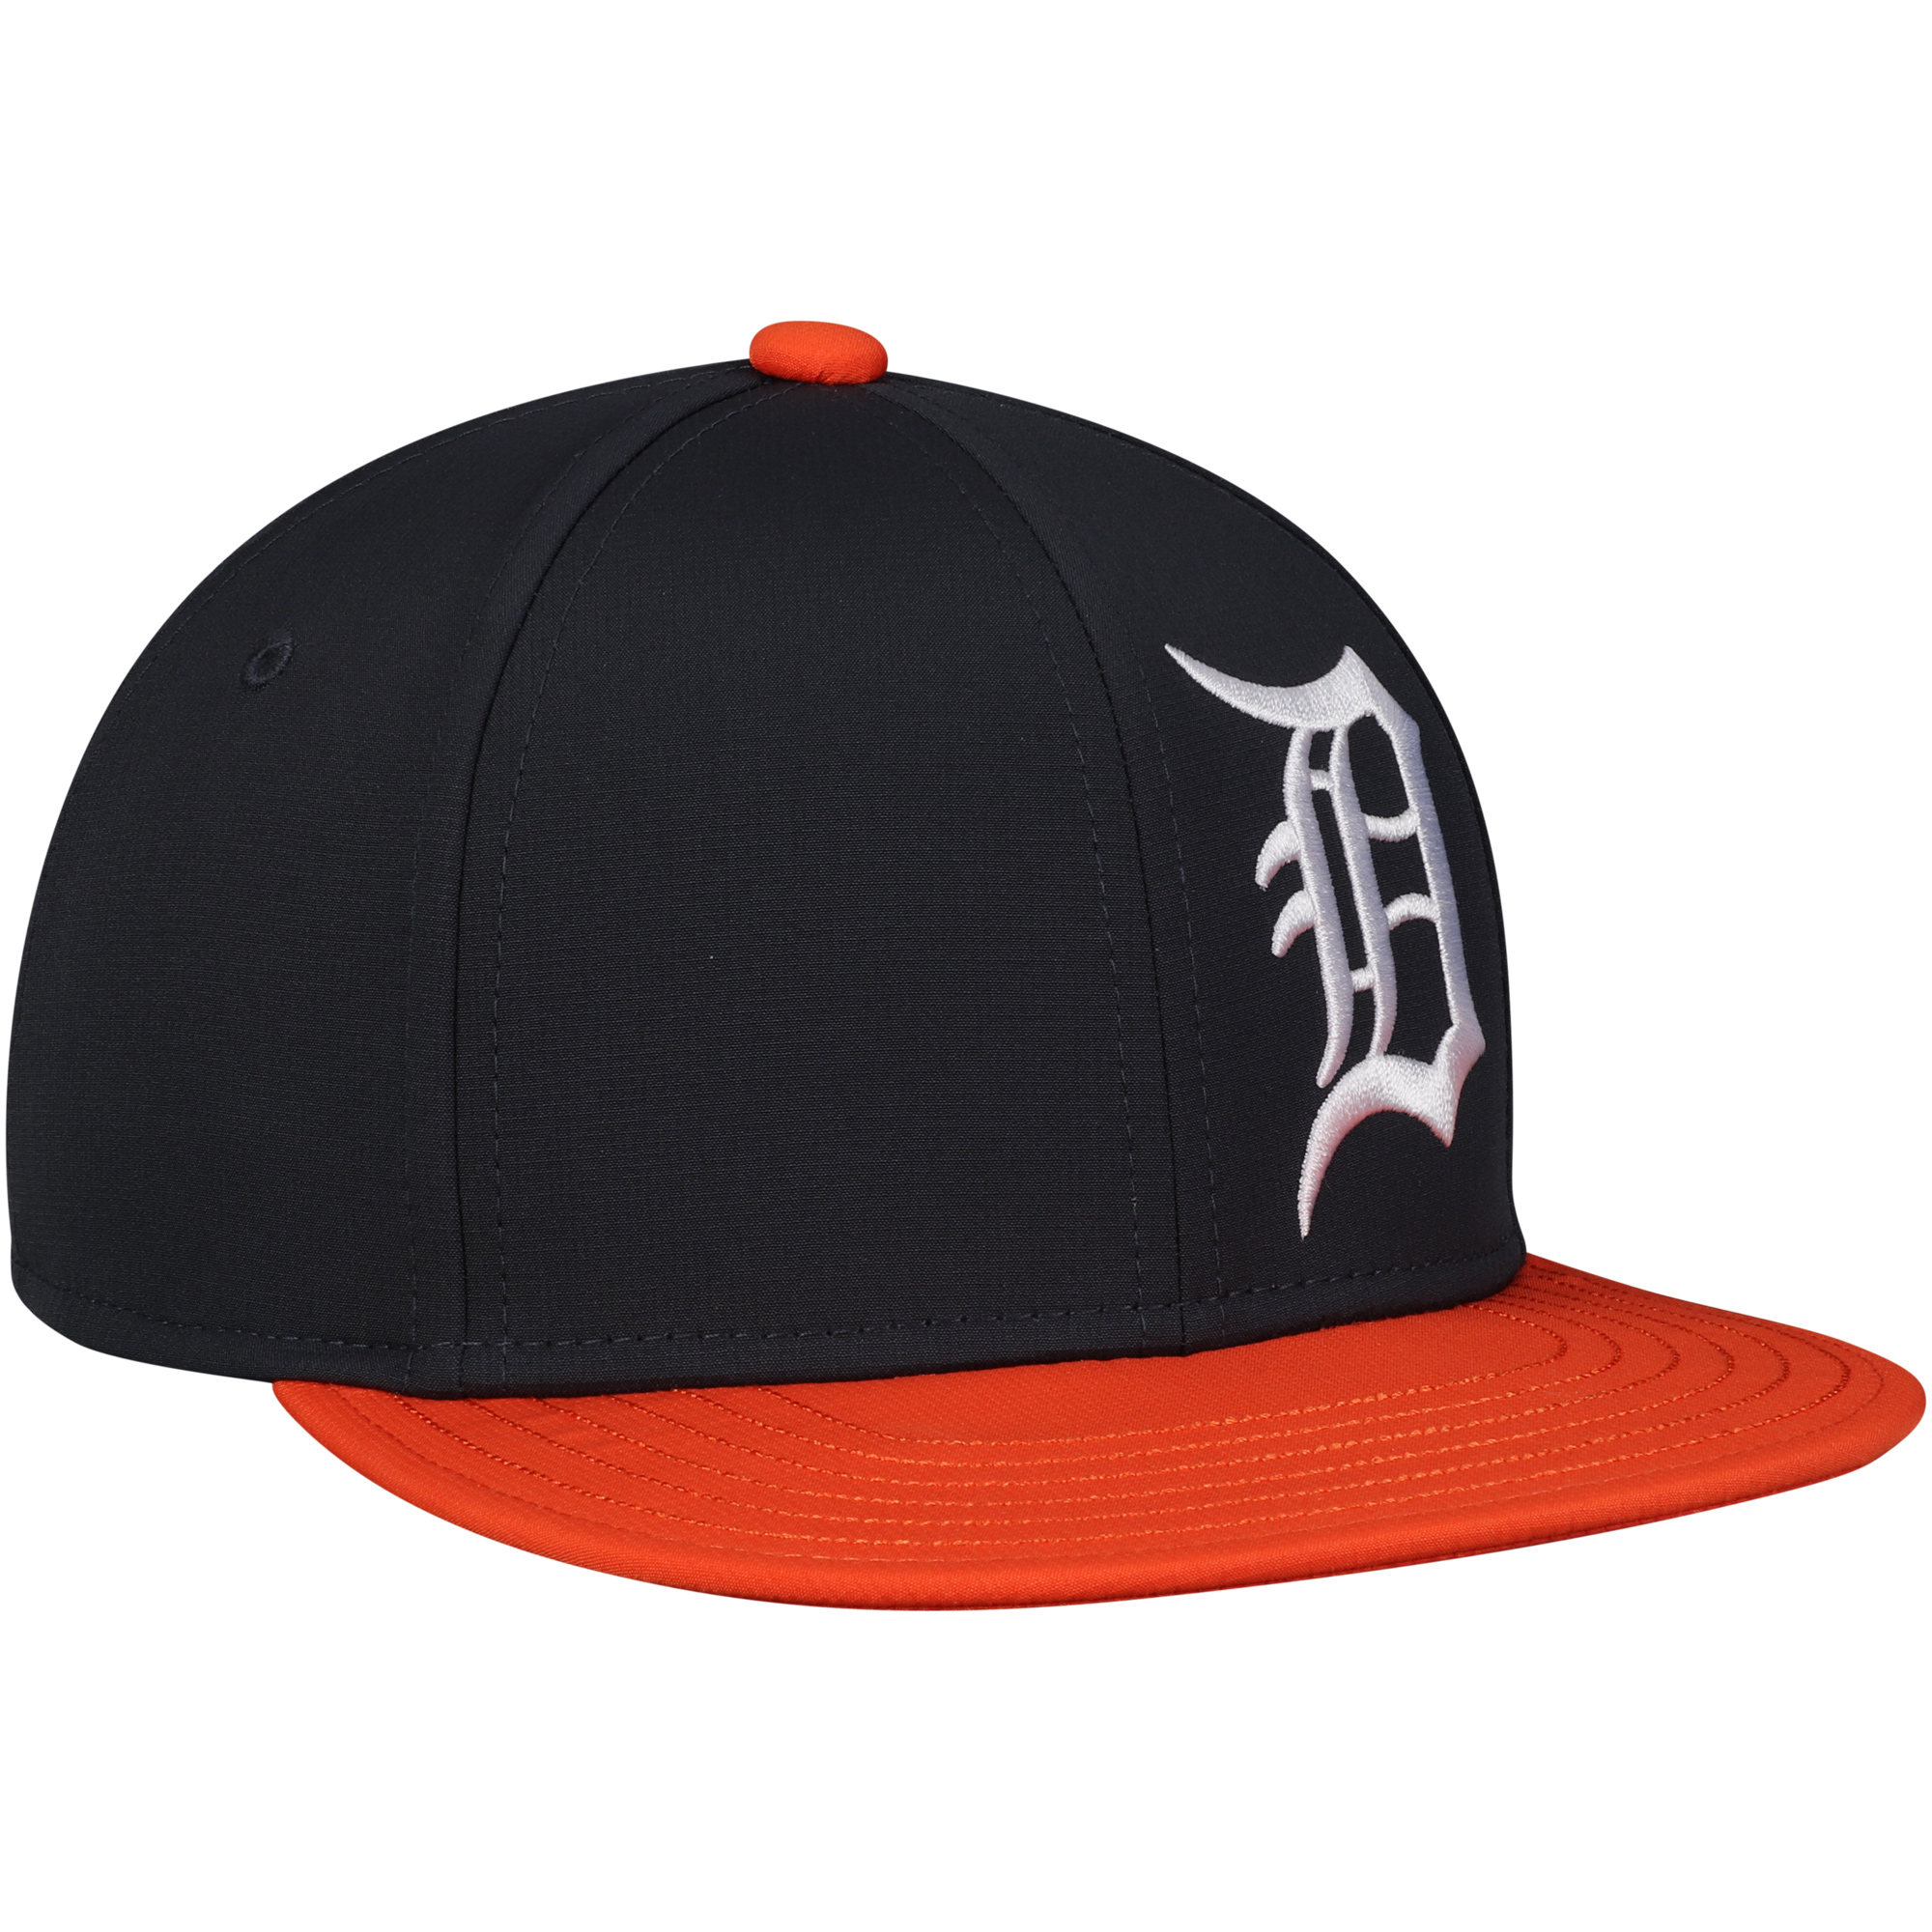 fb9f810c622 Detroit Tigers Under Armour Youth Big Logo Snapback Adjustable Hat - Black  - OSFA - Walmart.com